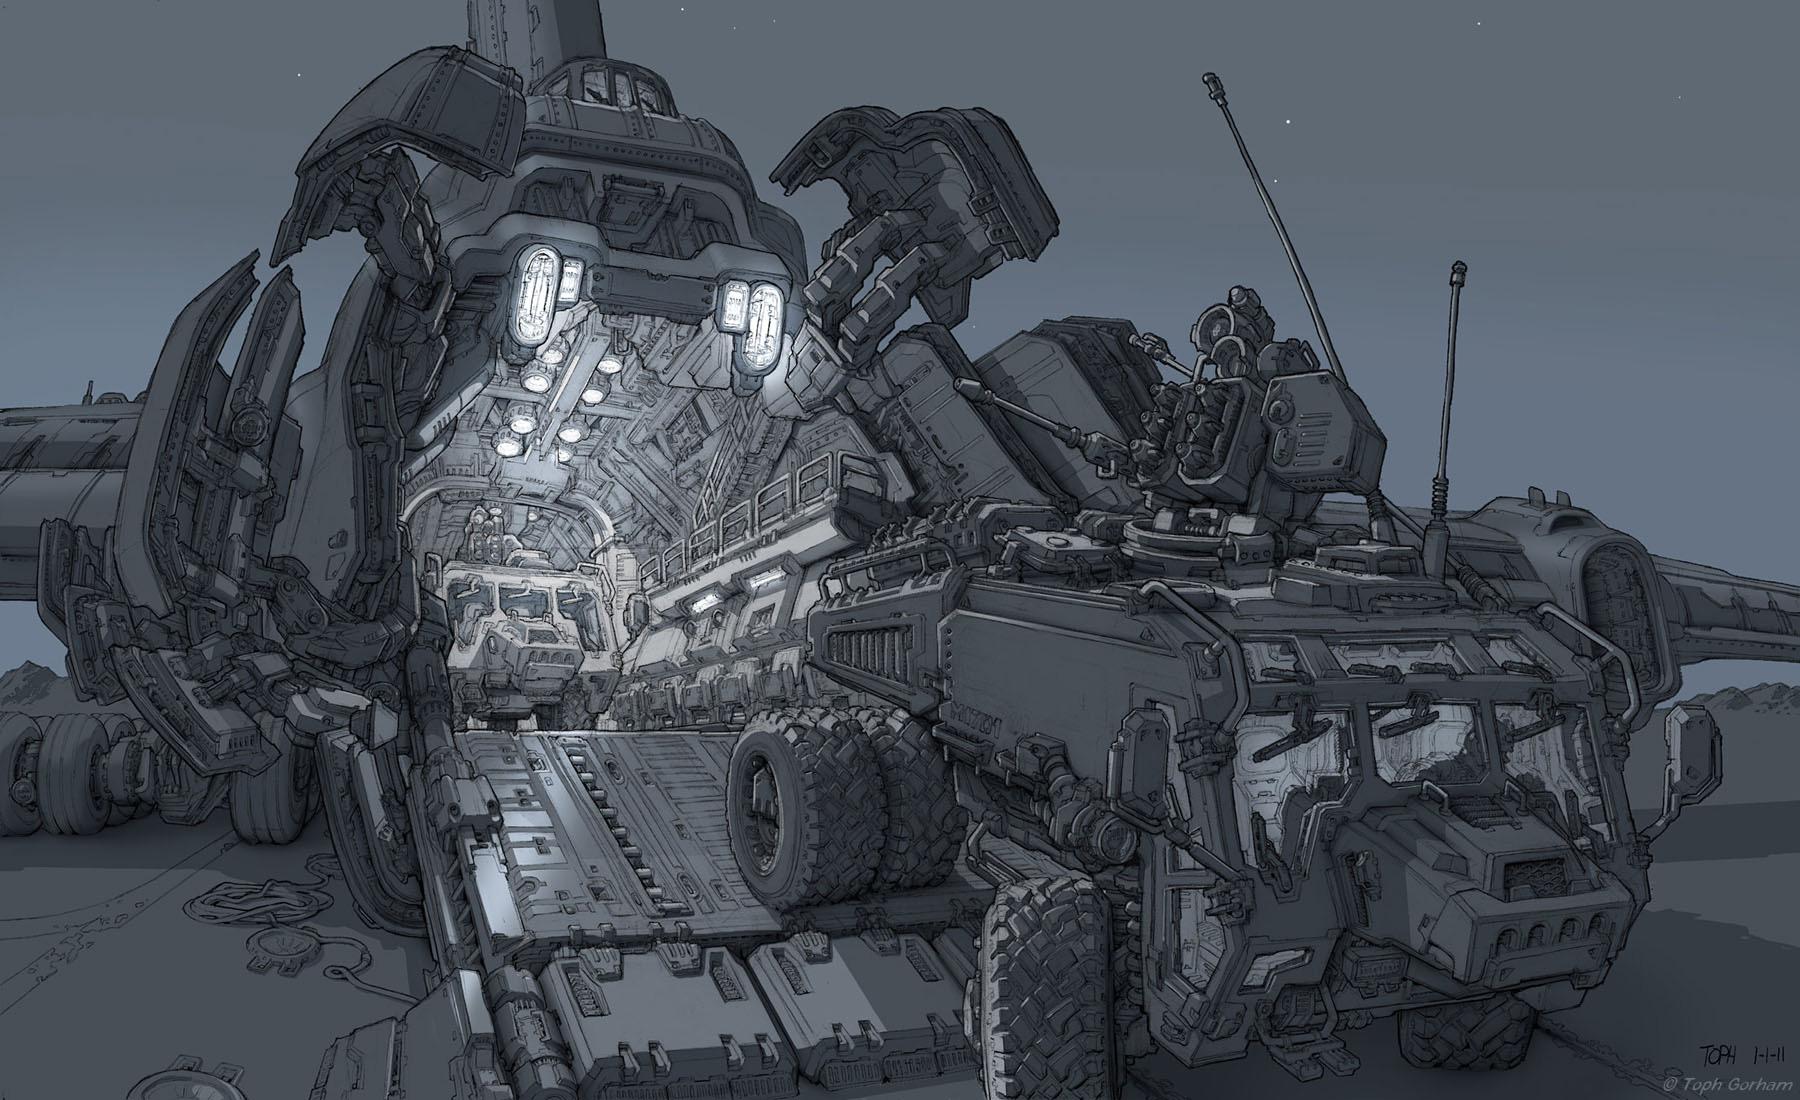 Toph_Gorham_Concept_Art_04_DropShip.jpg